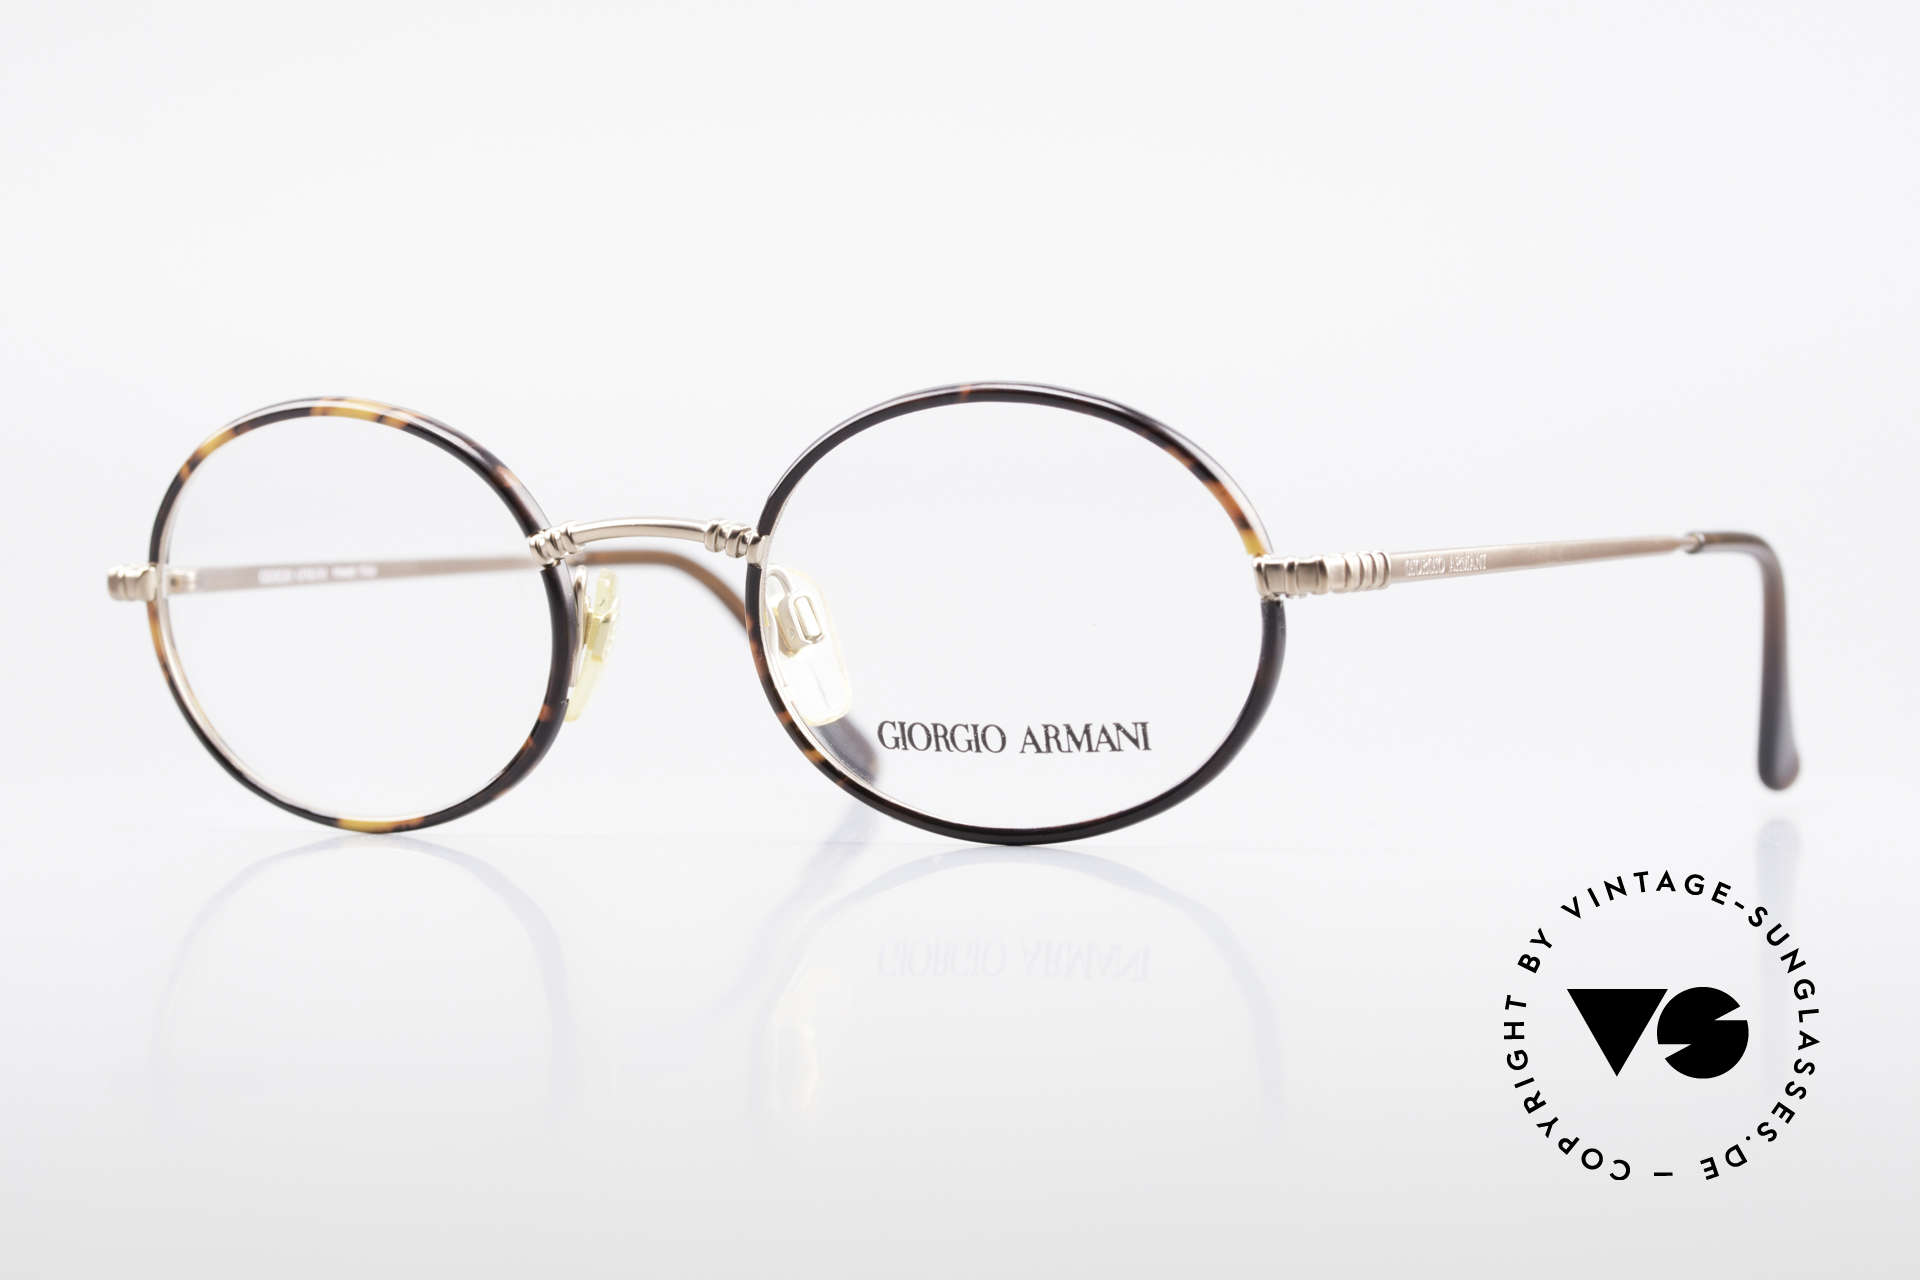 Giorgio Armani 223 Oval Vintage 90's Eyeglasses, vintage designer eyeglass-frame by GIORGIO Armani, Made for Men and Women